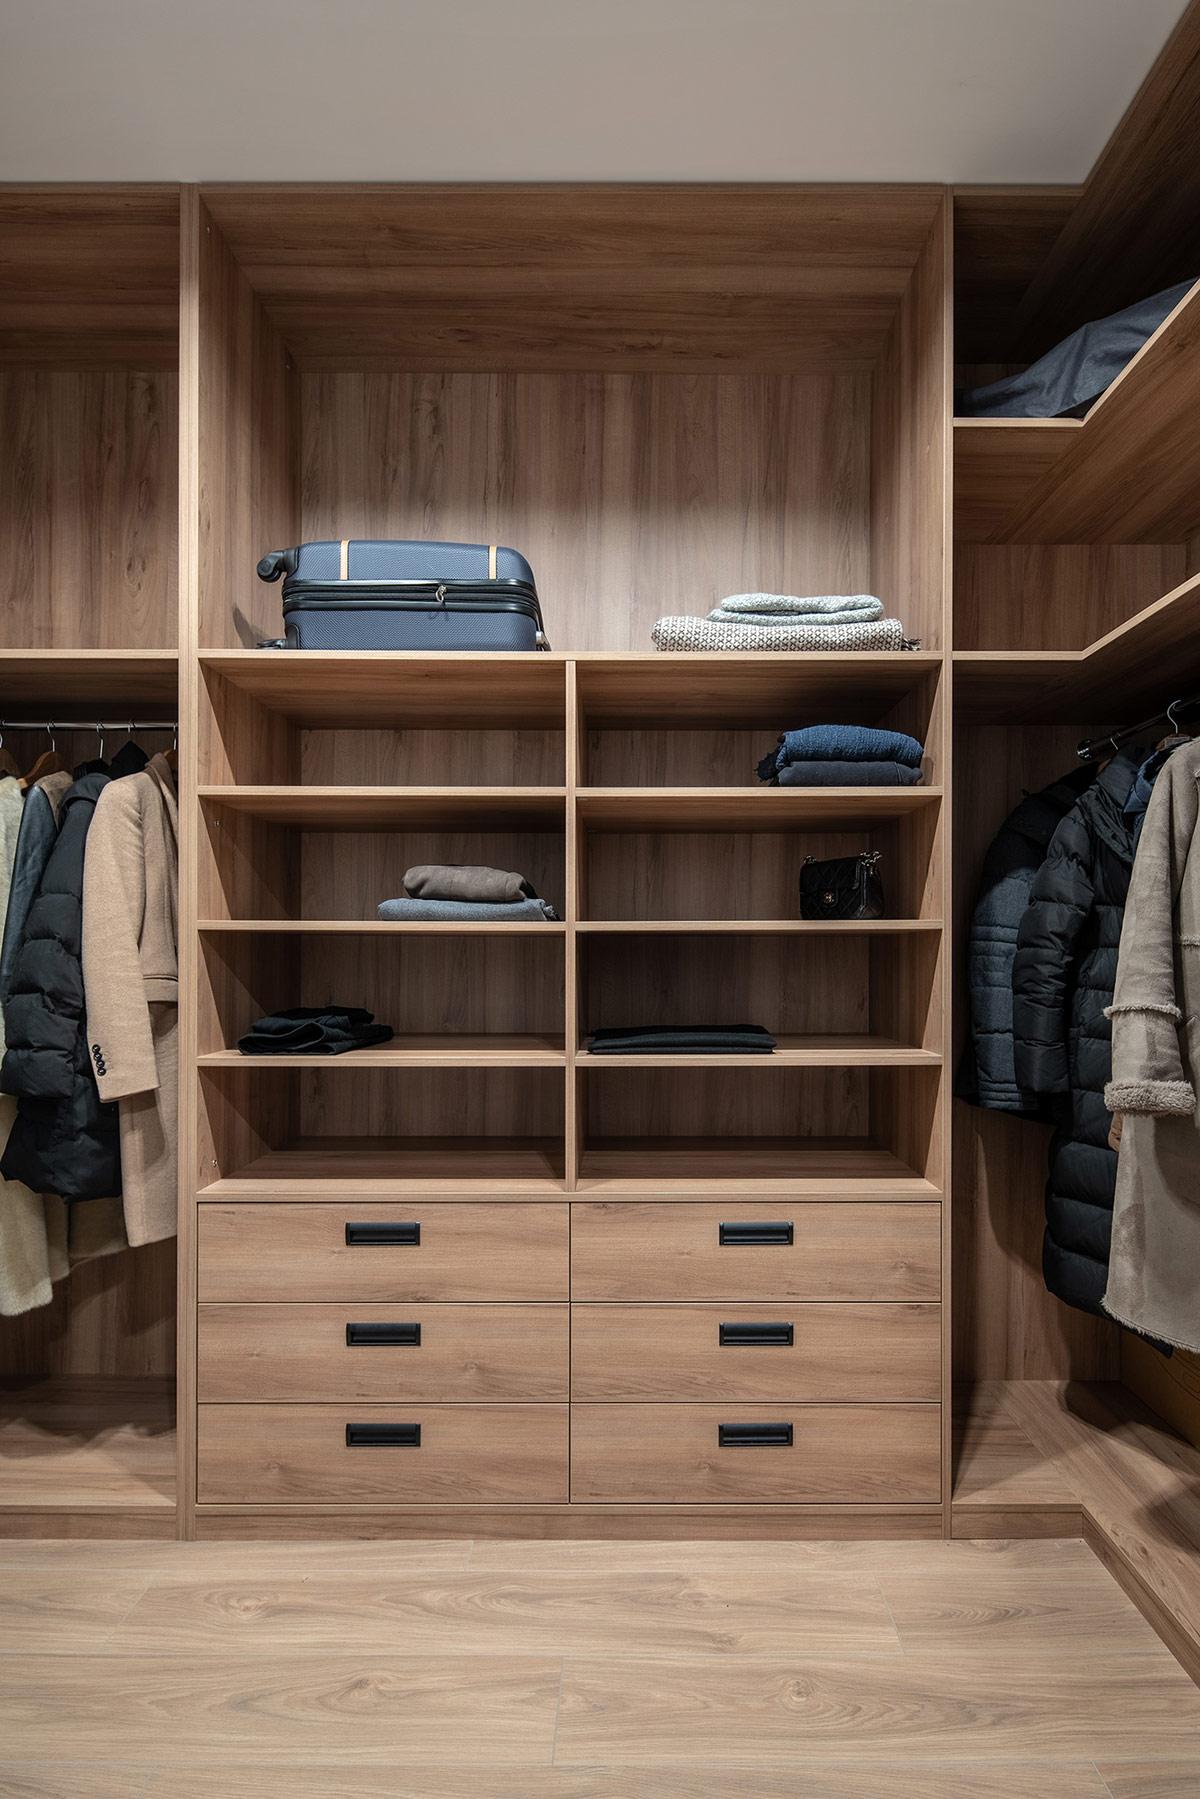 dressing-room-1